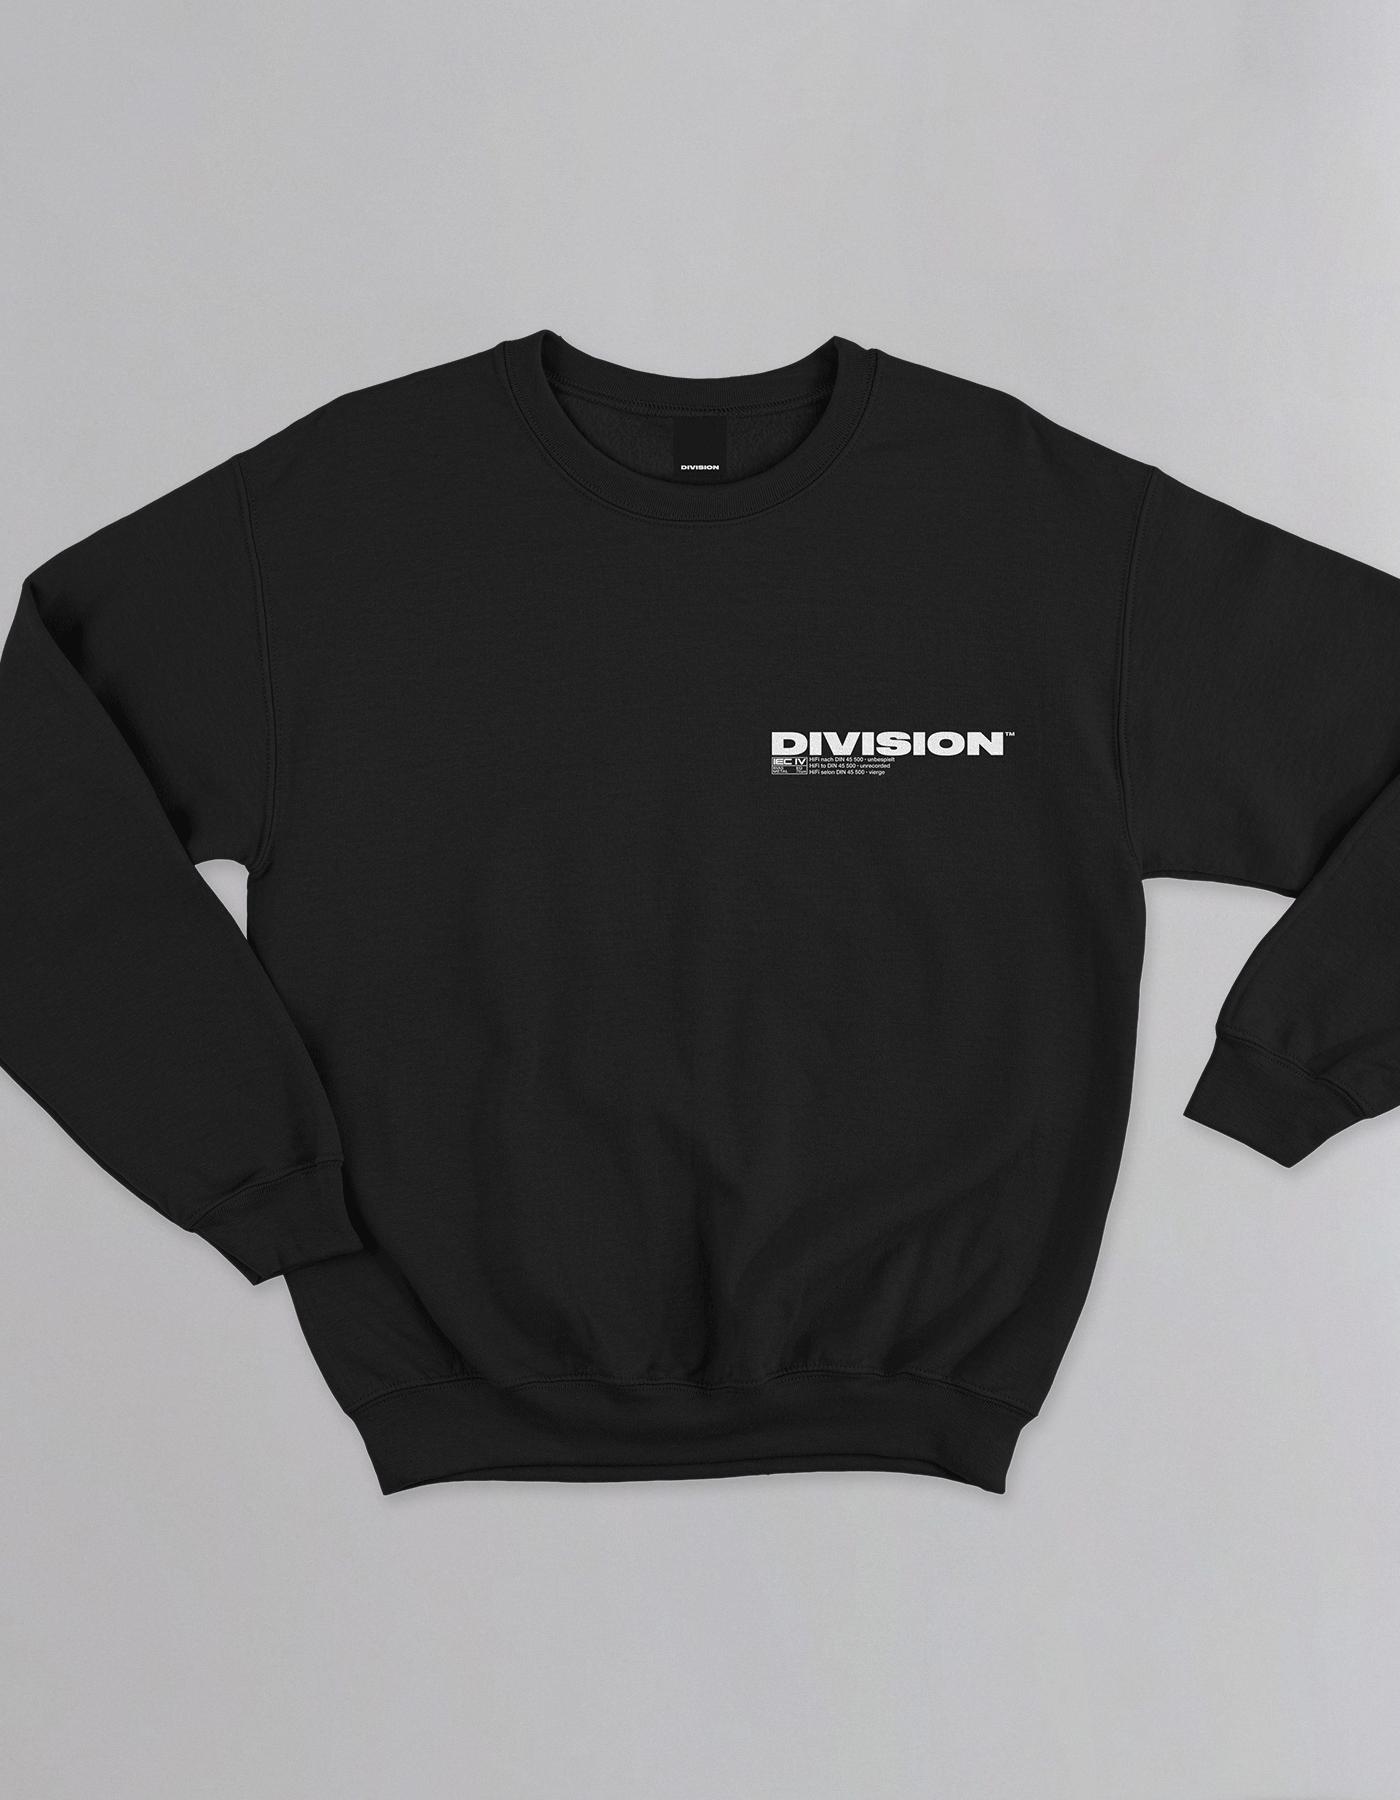 DIVISION Merch - Logo Sweater Bild